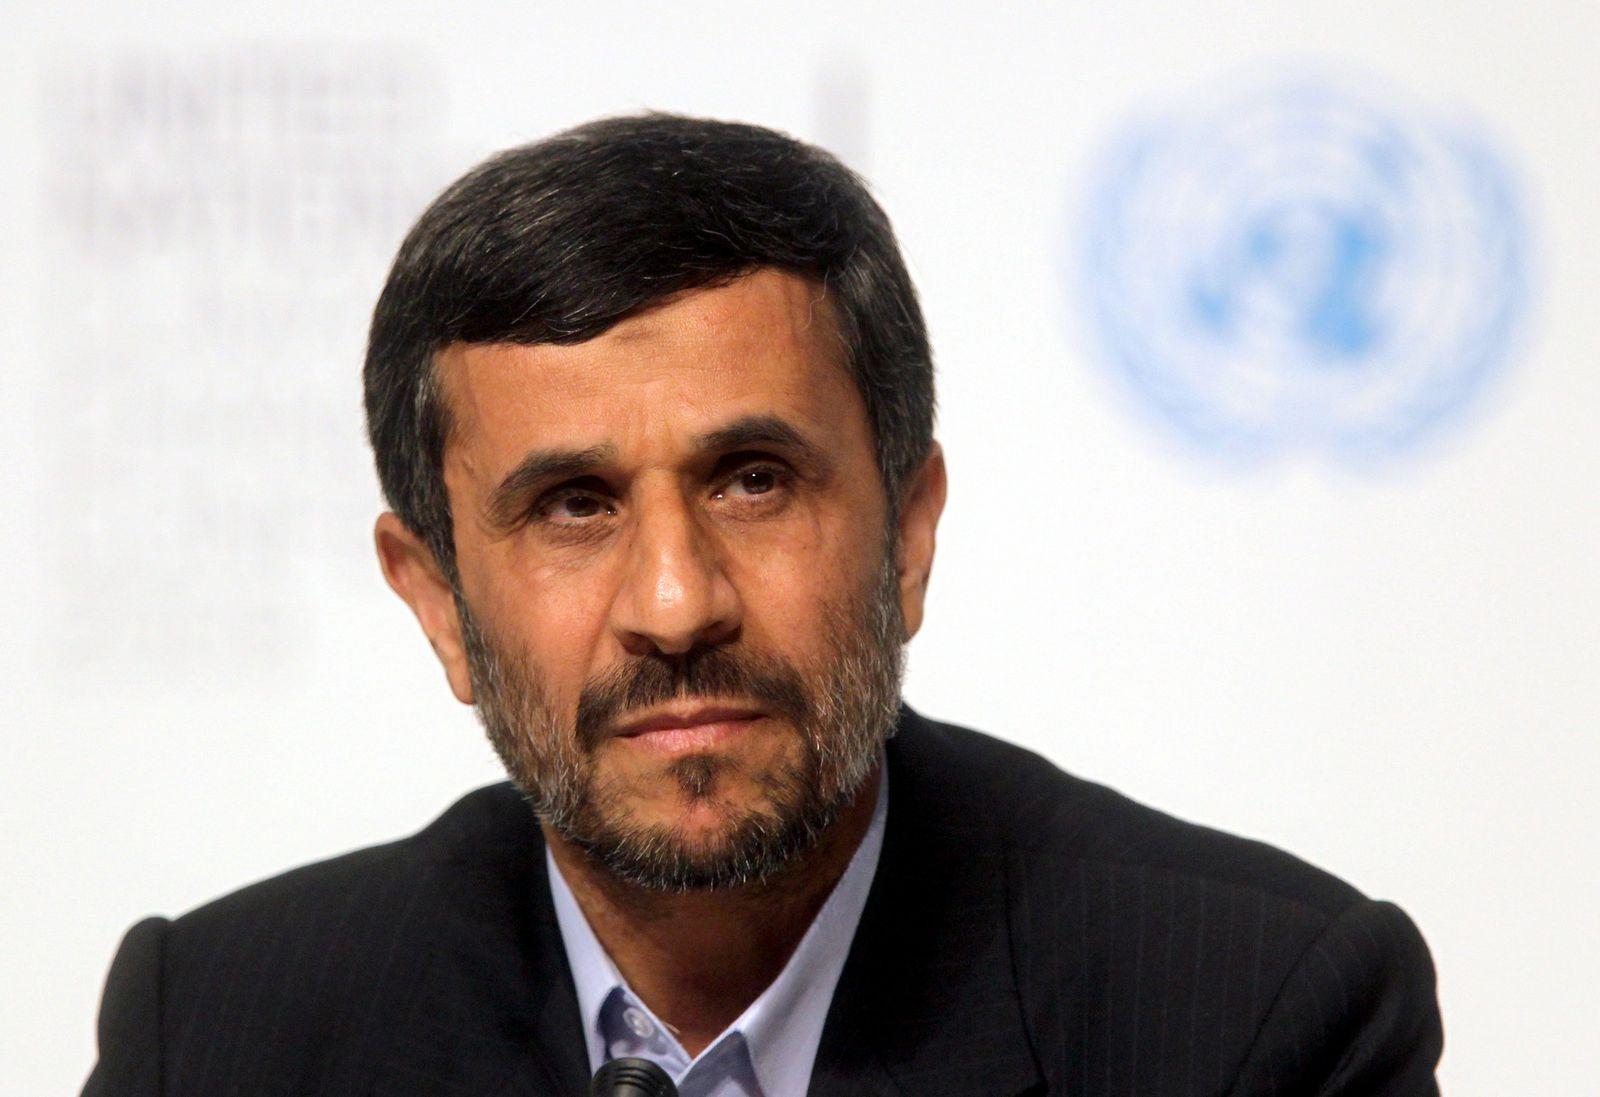 Diktatoren in London / Ahmadinedschad